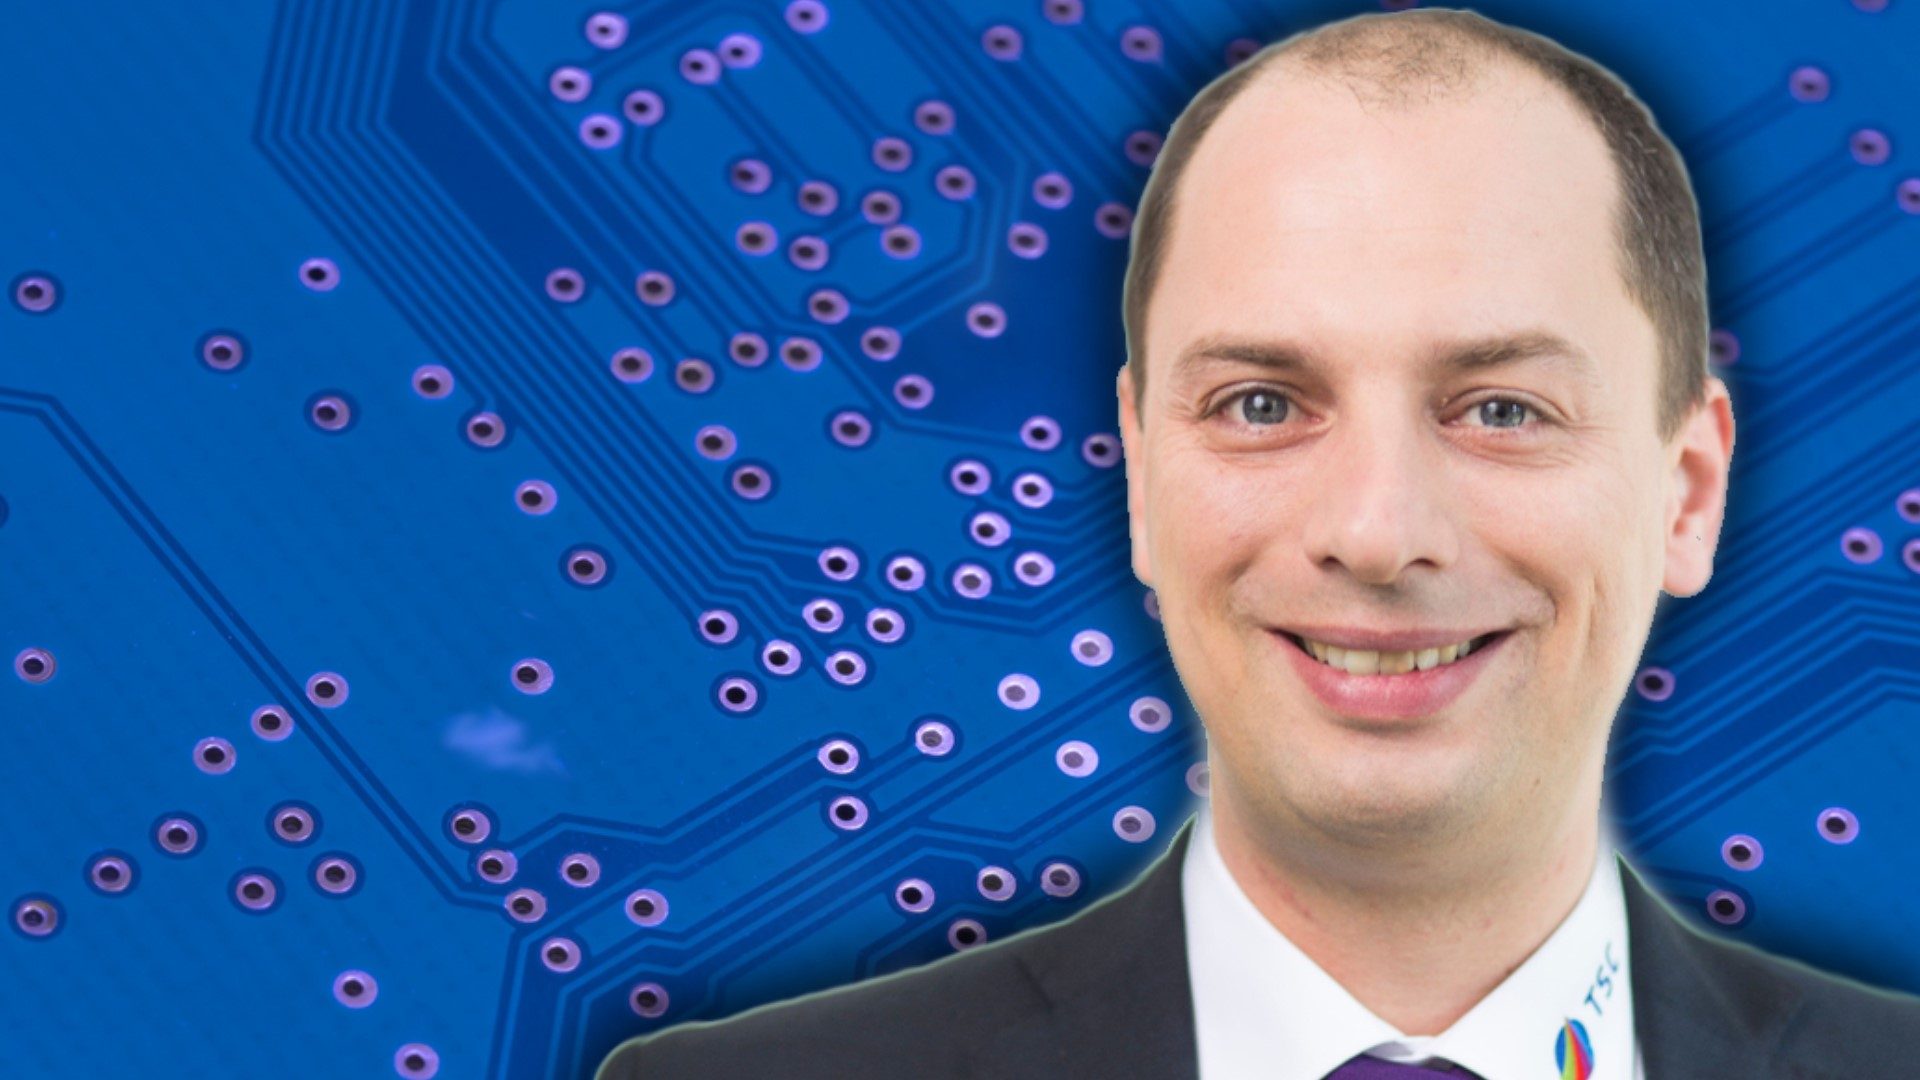 Jakub Maly, TSCNET Services